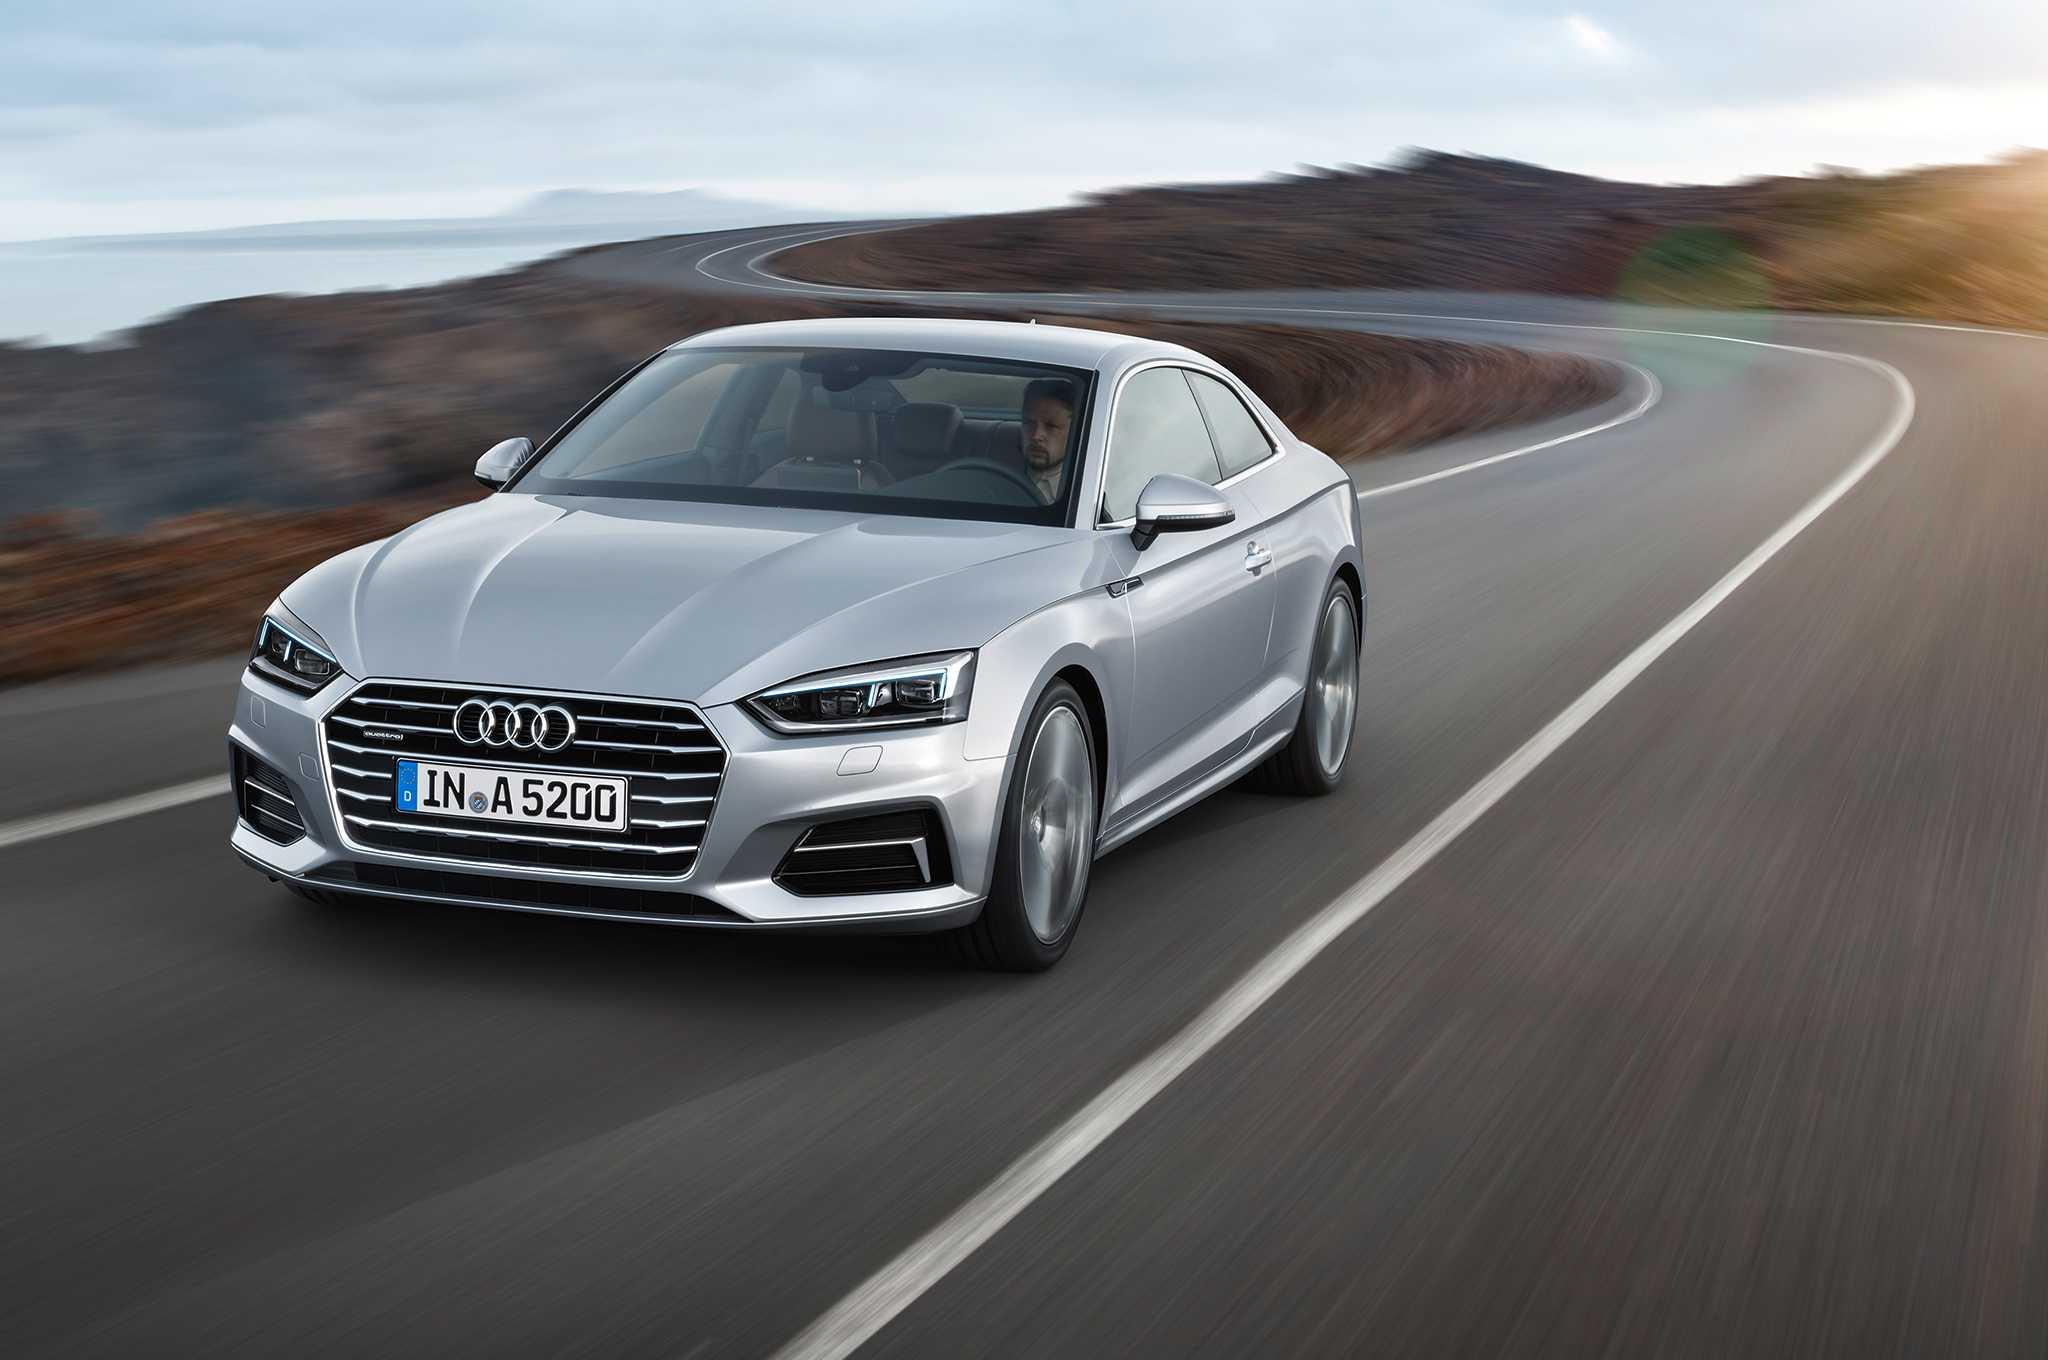 2018 audi a5 range set to feature manual transmission rh nashvillechatterclass com New Audi with Manual Transmission Audi TT Quattro Manual Transmission